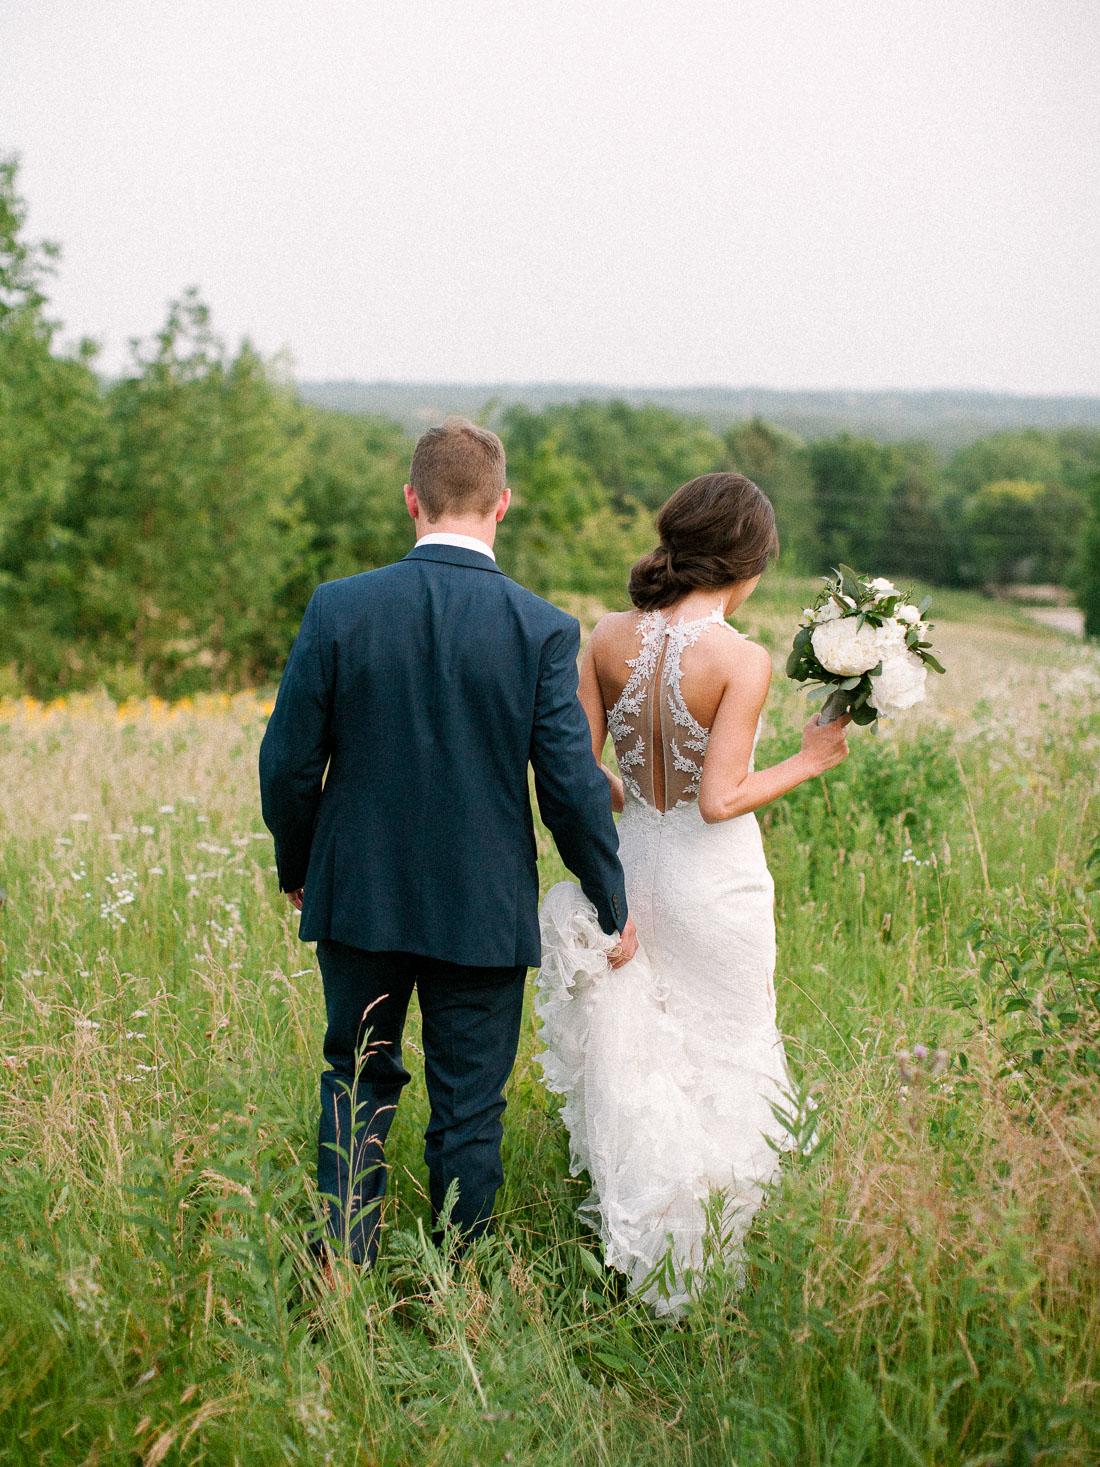 kateweinsteinphoto_milwaukee_wedding_tent-301.jpg